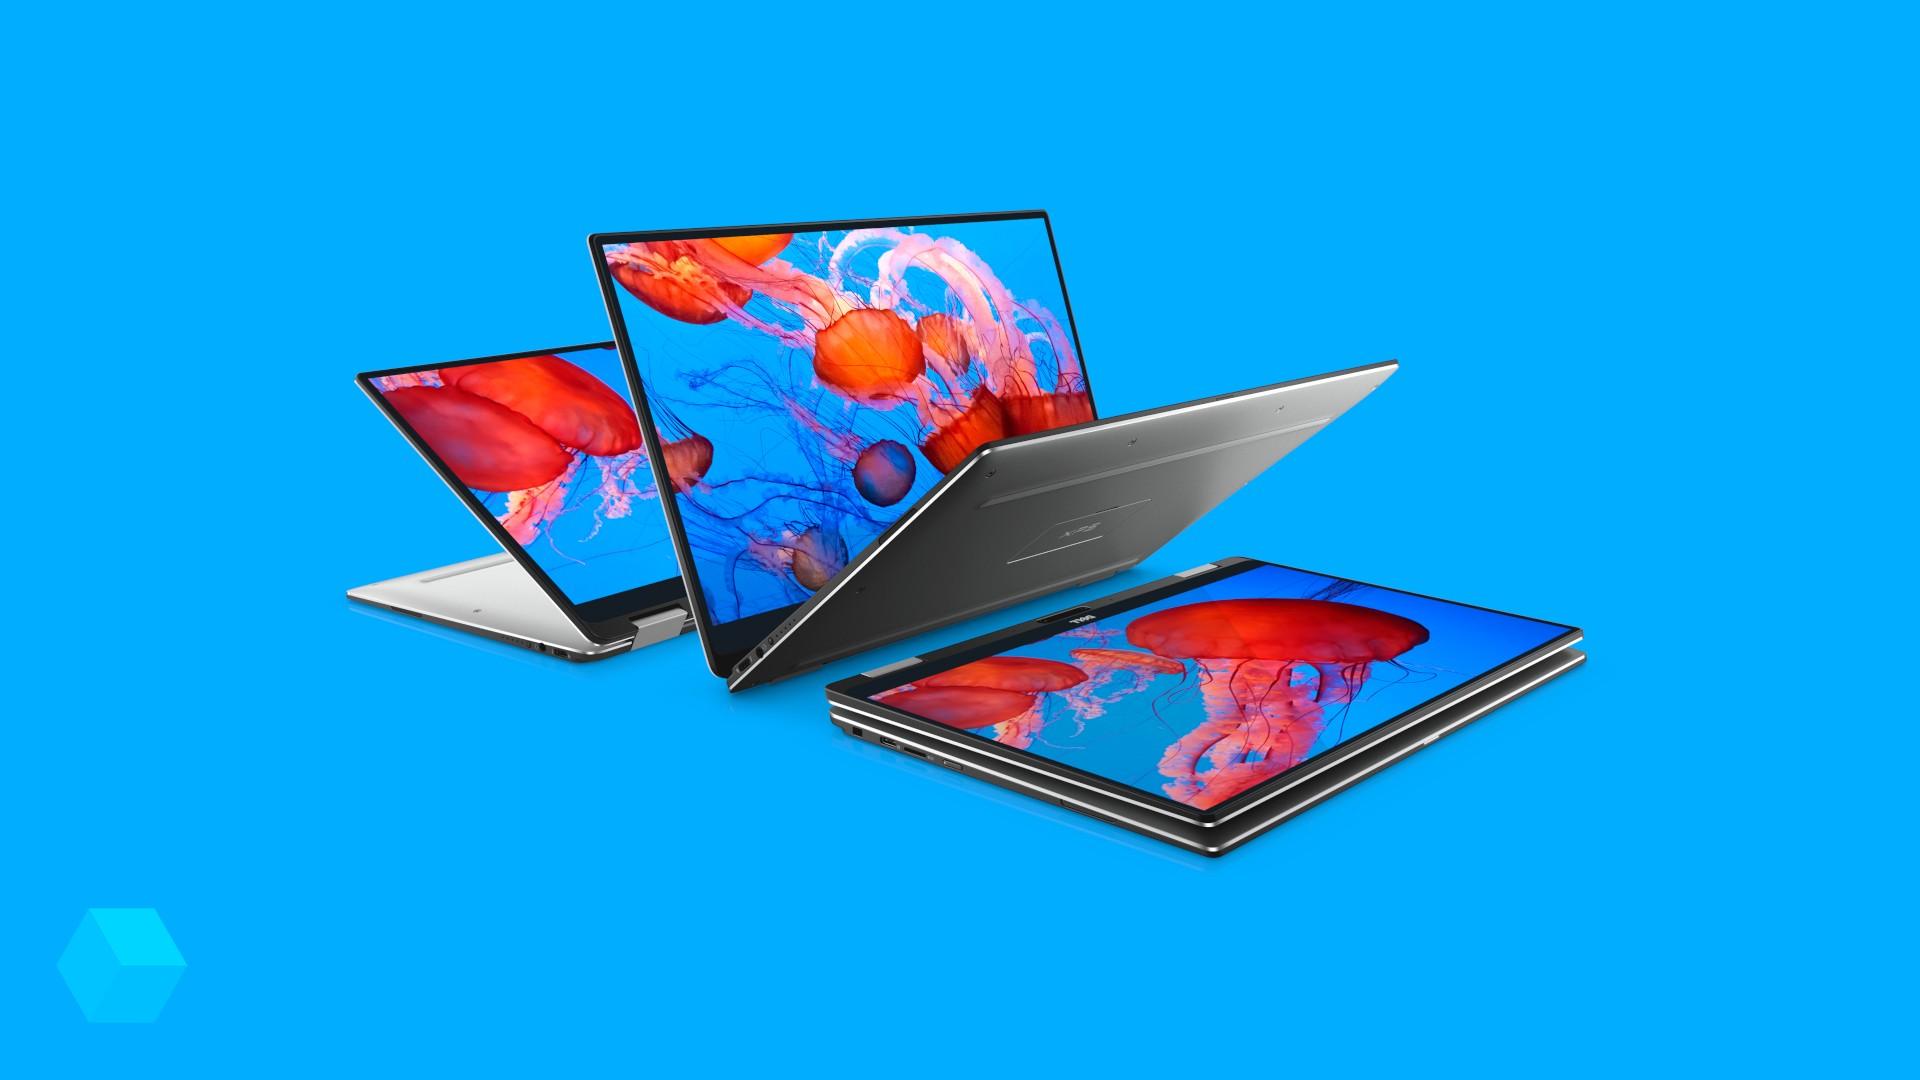 Dell на IFA 2018: хромбук, трансформеры и HDR-монитор